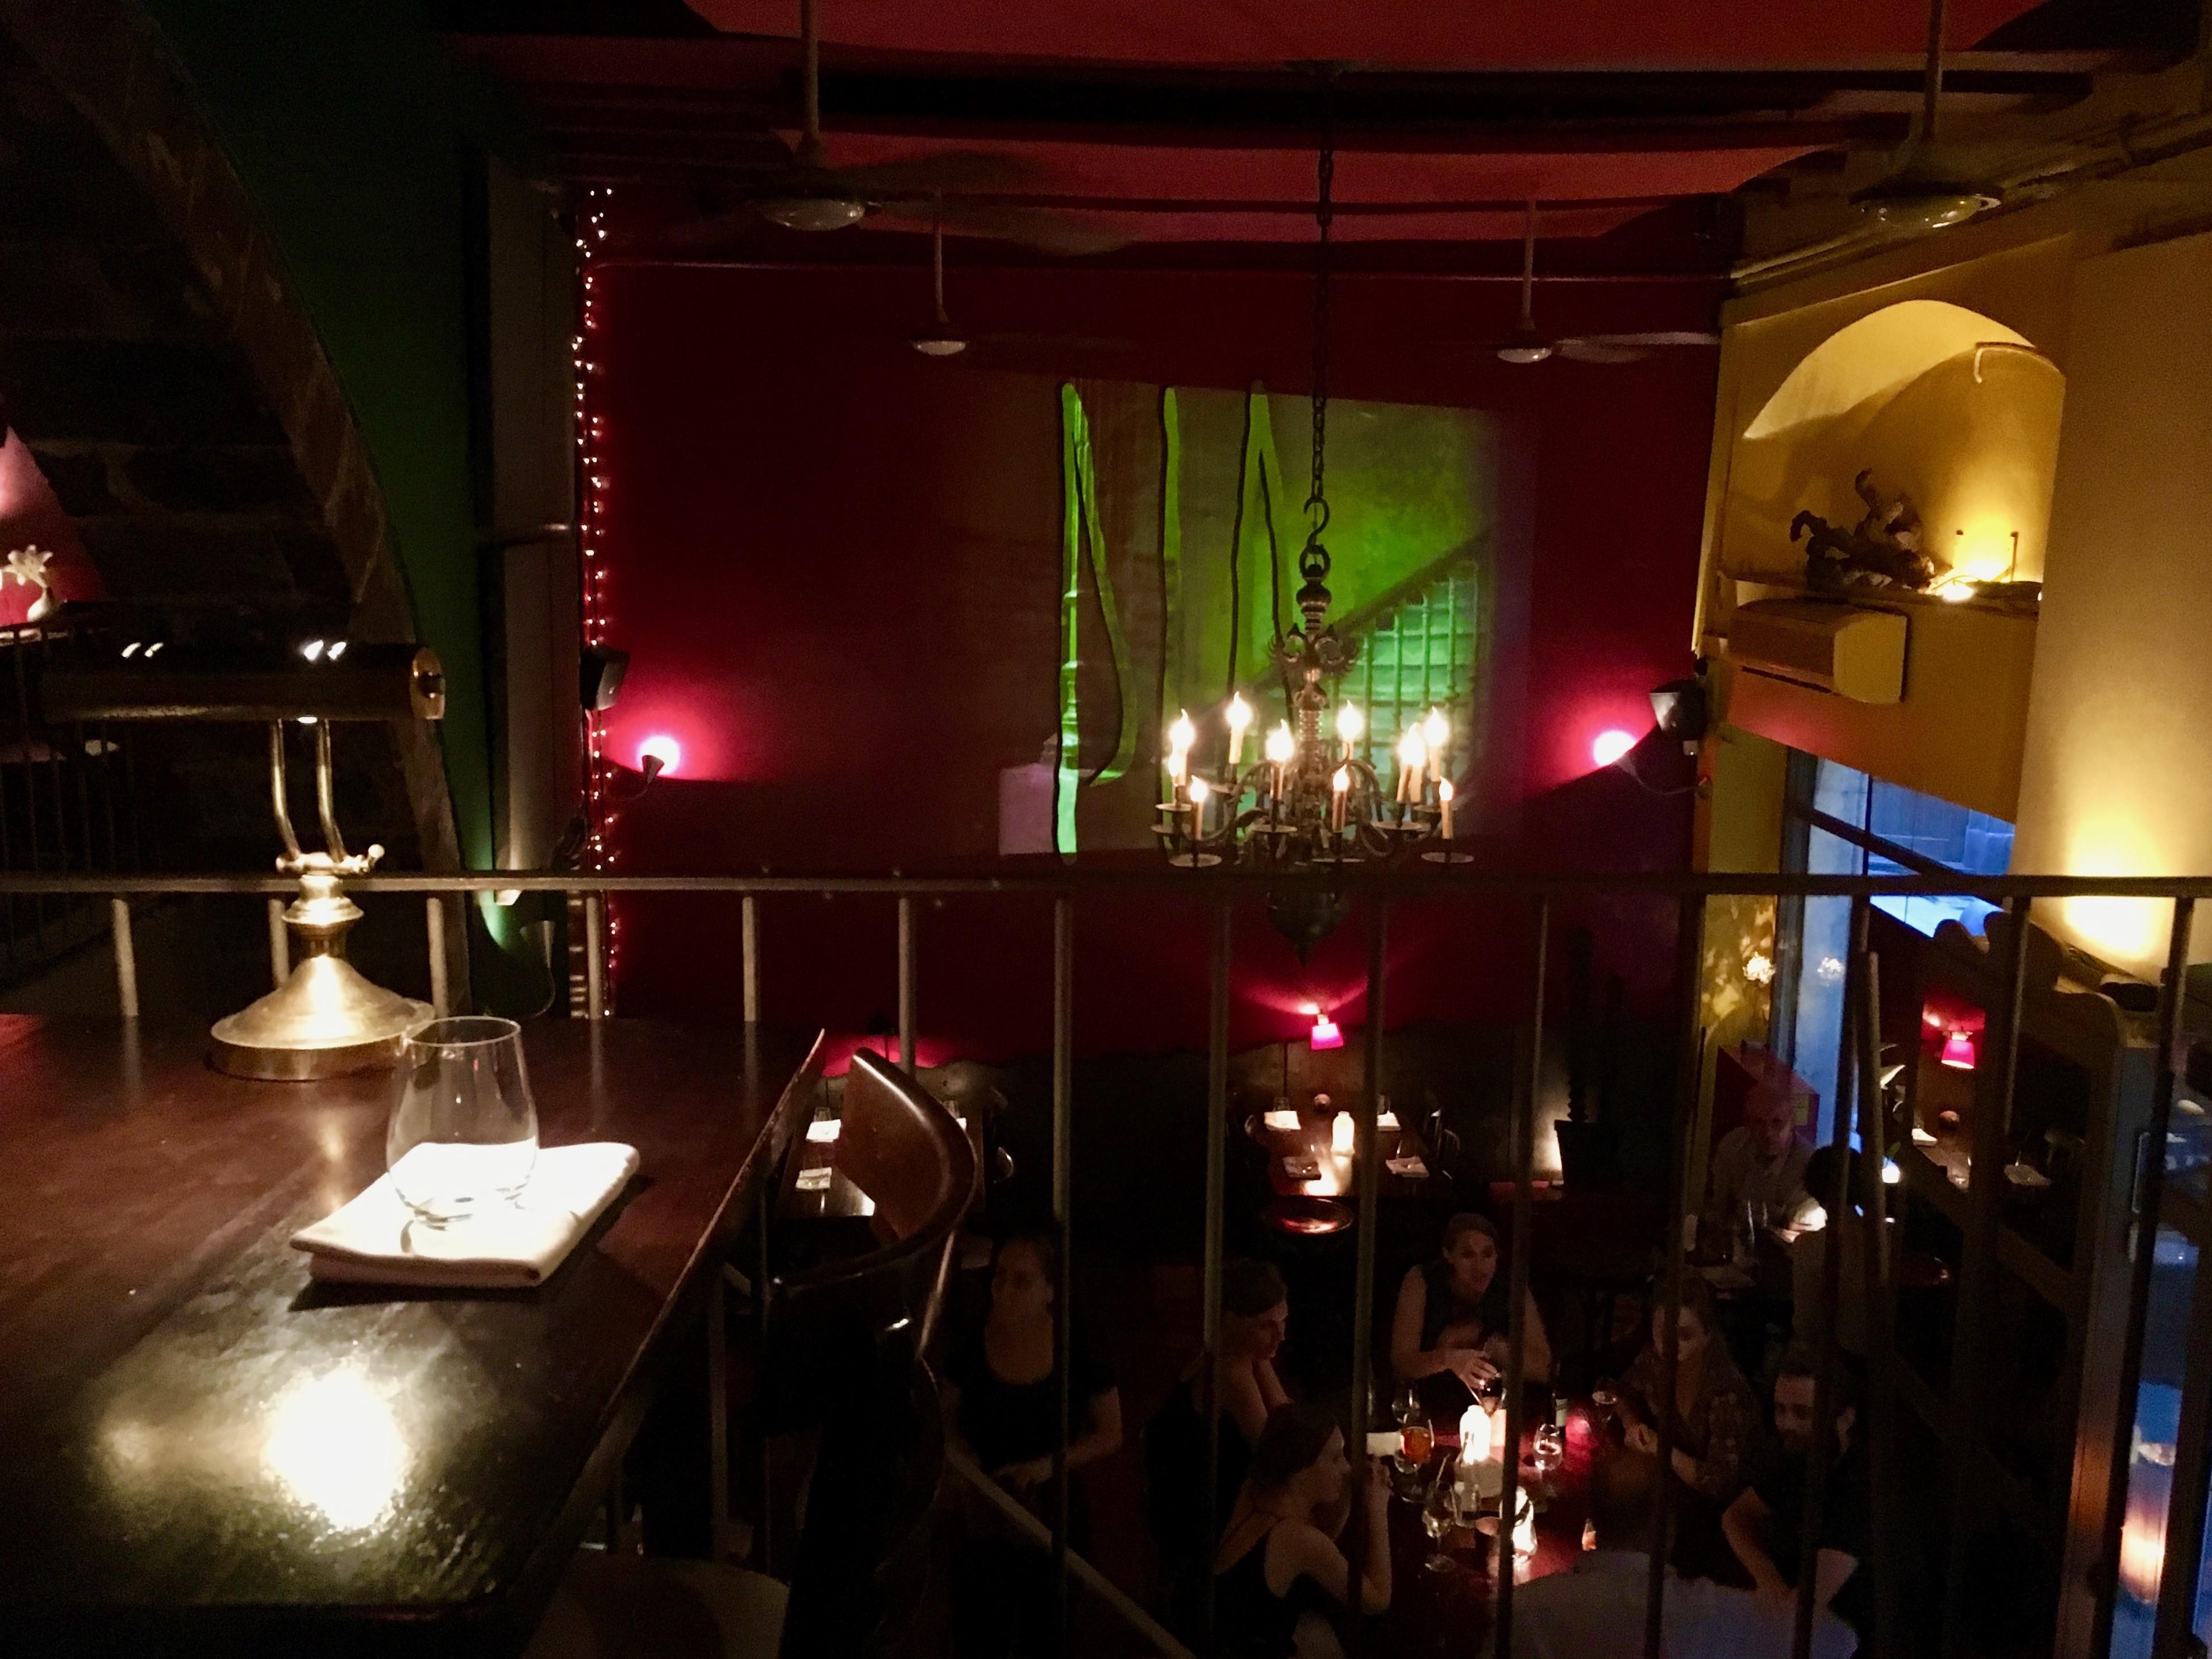 Pla, Restaurant, Barcelona